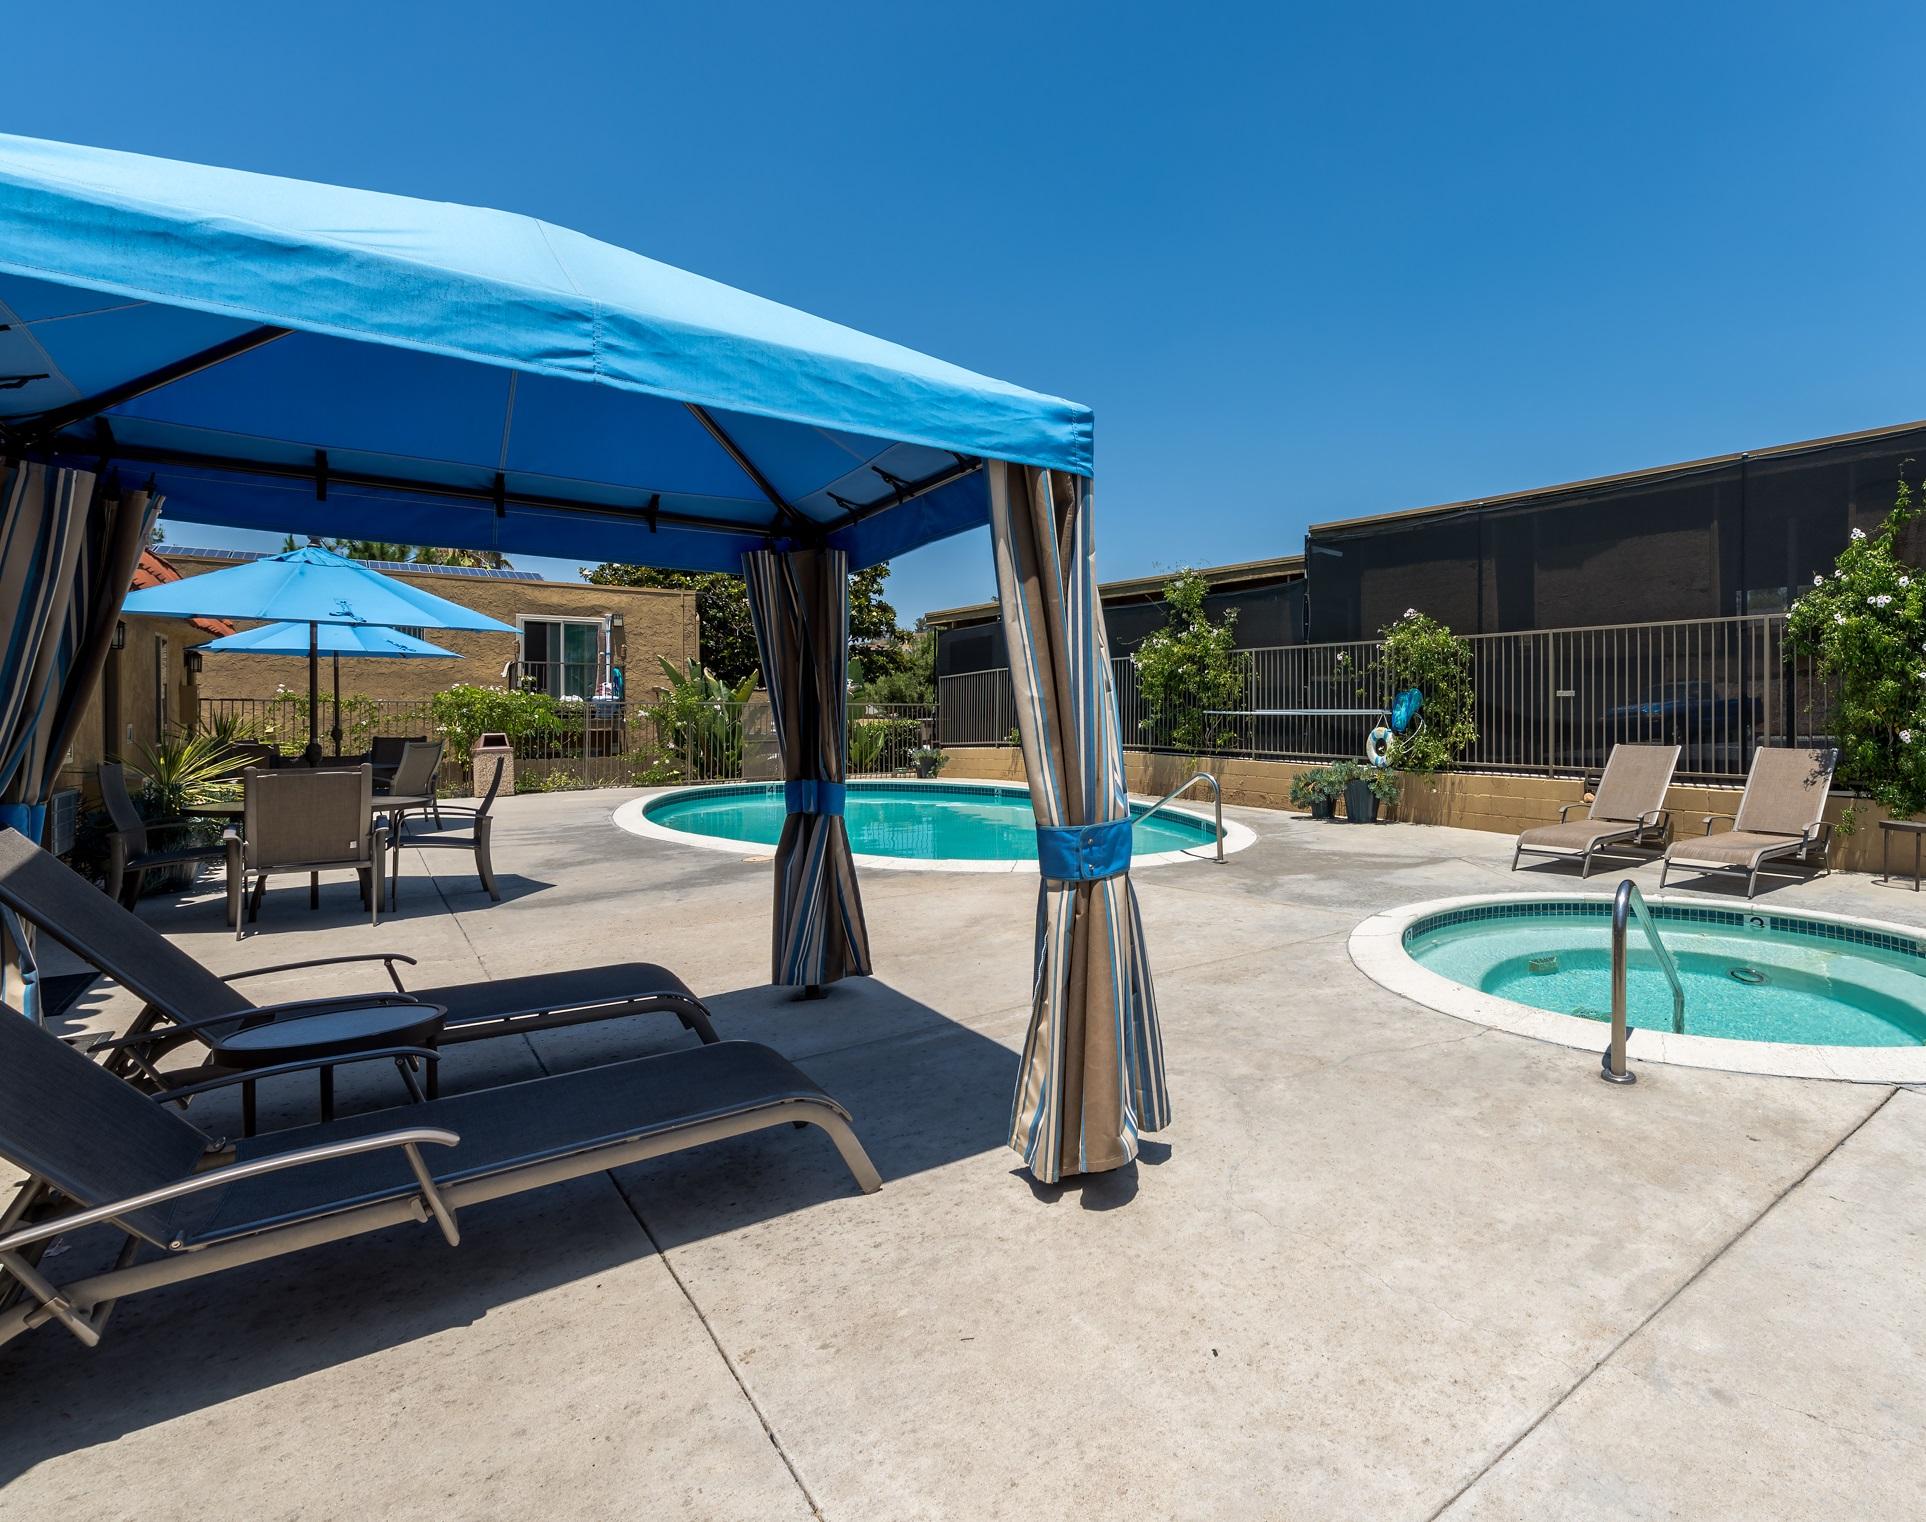 Cabana Pool & Spa - Cropped.jpg